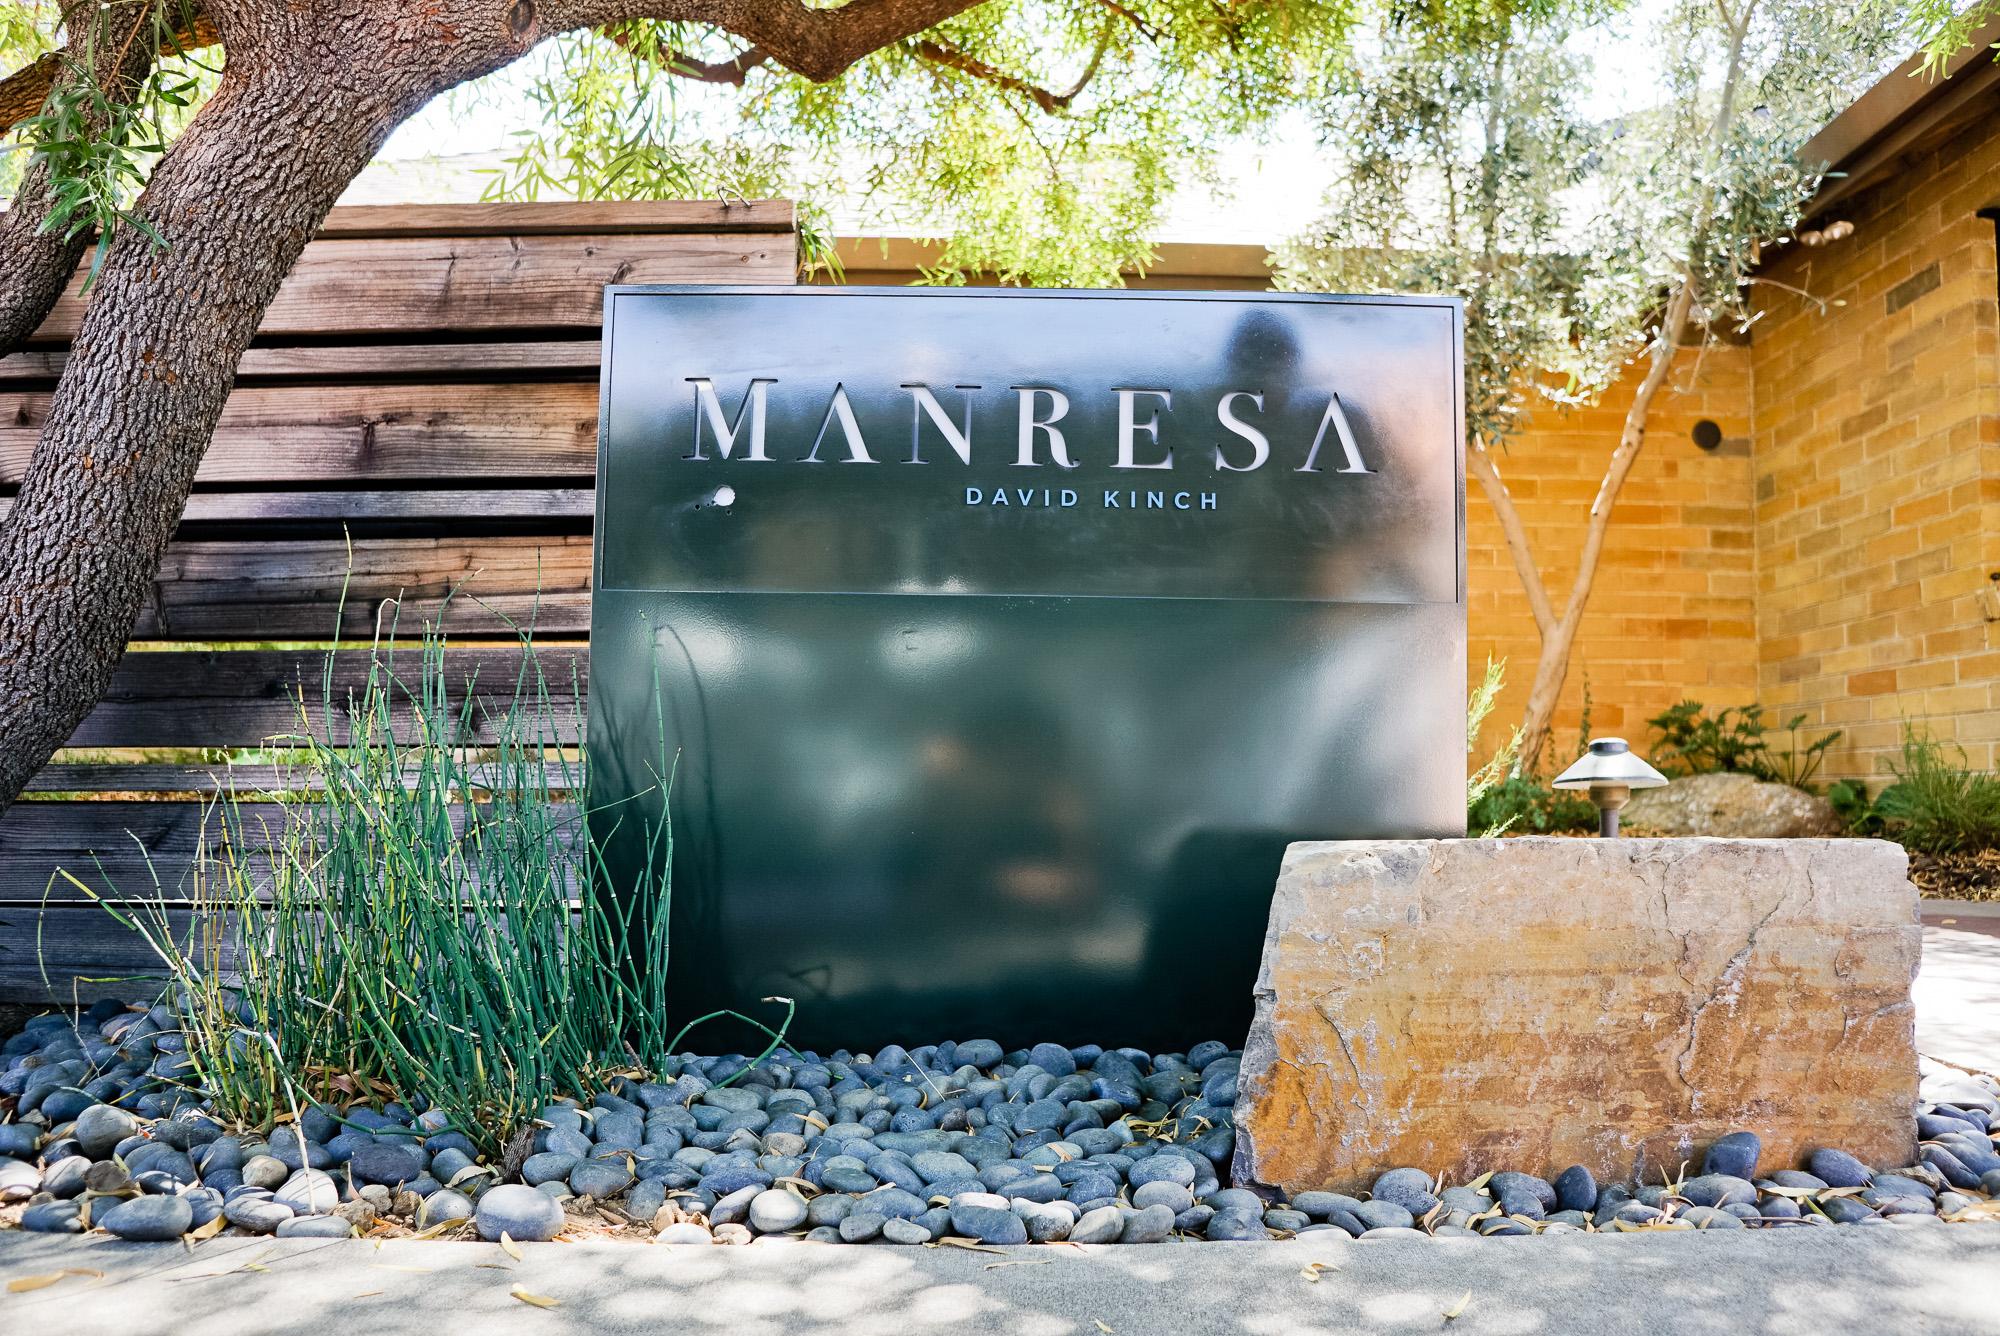 Manresa restaurant modern simple illuminated monument sign